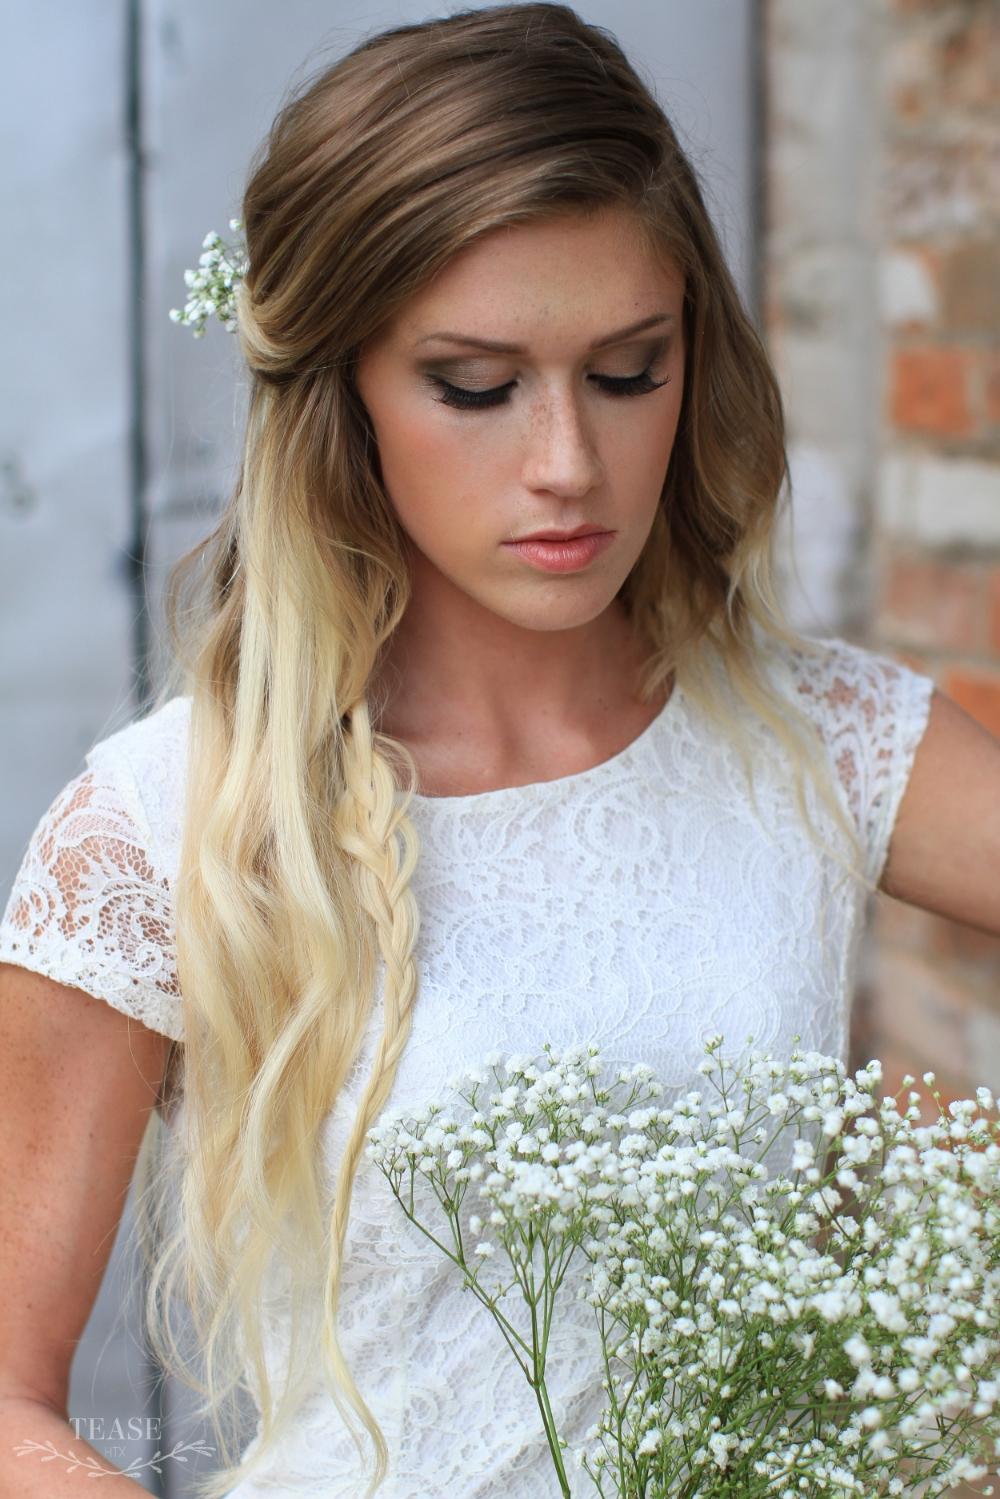 houston-bridal-hair-makeup-natural-airbrush-texas.jpg